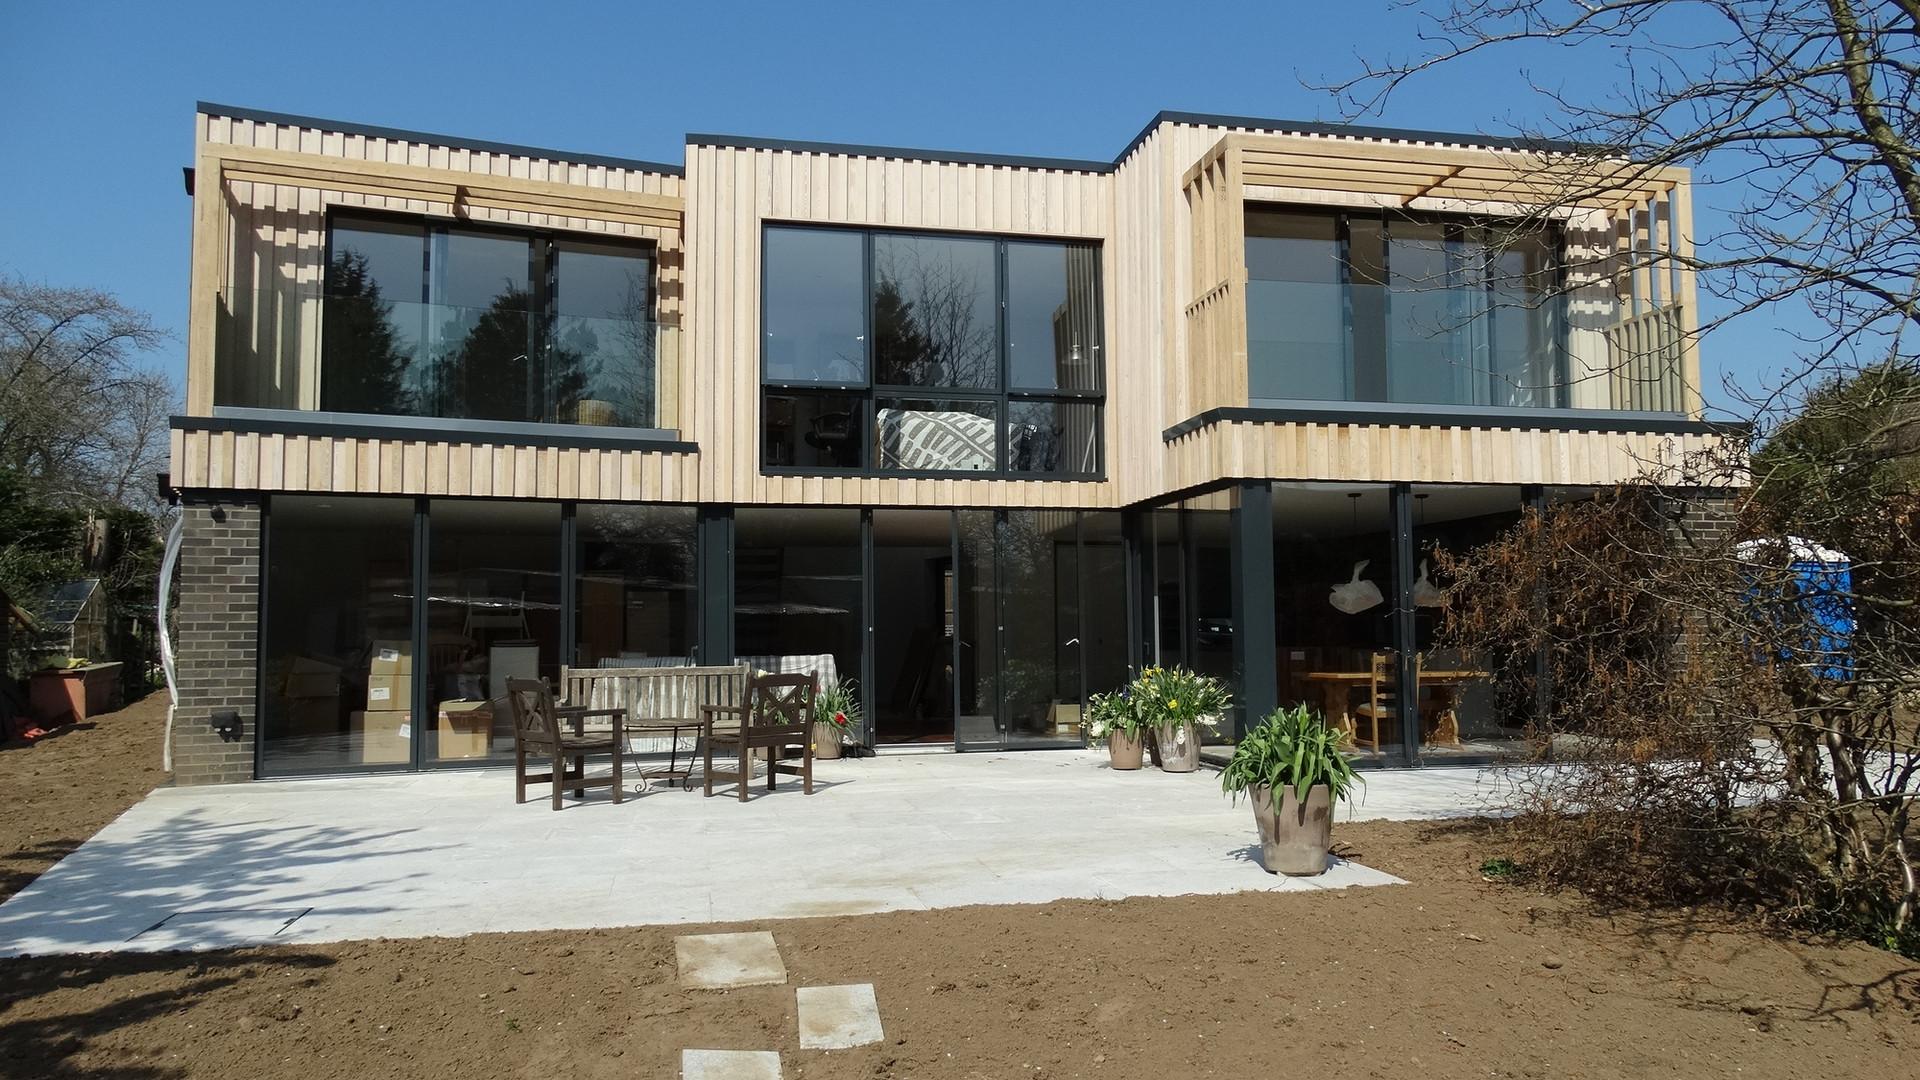 New House Build Exterior - Addington